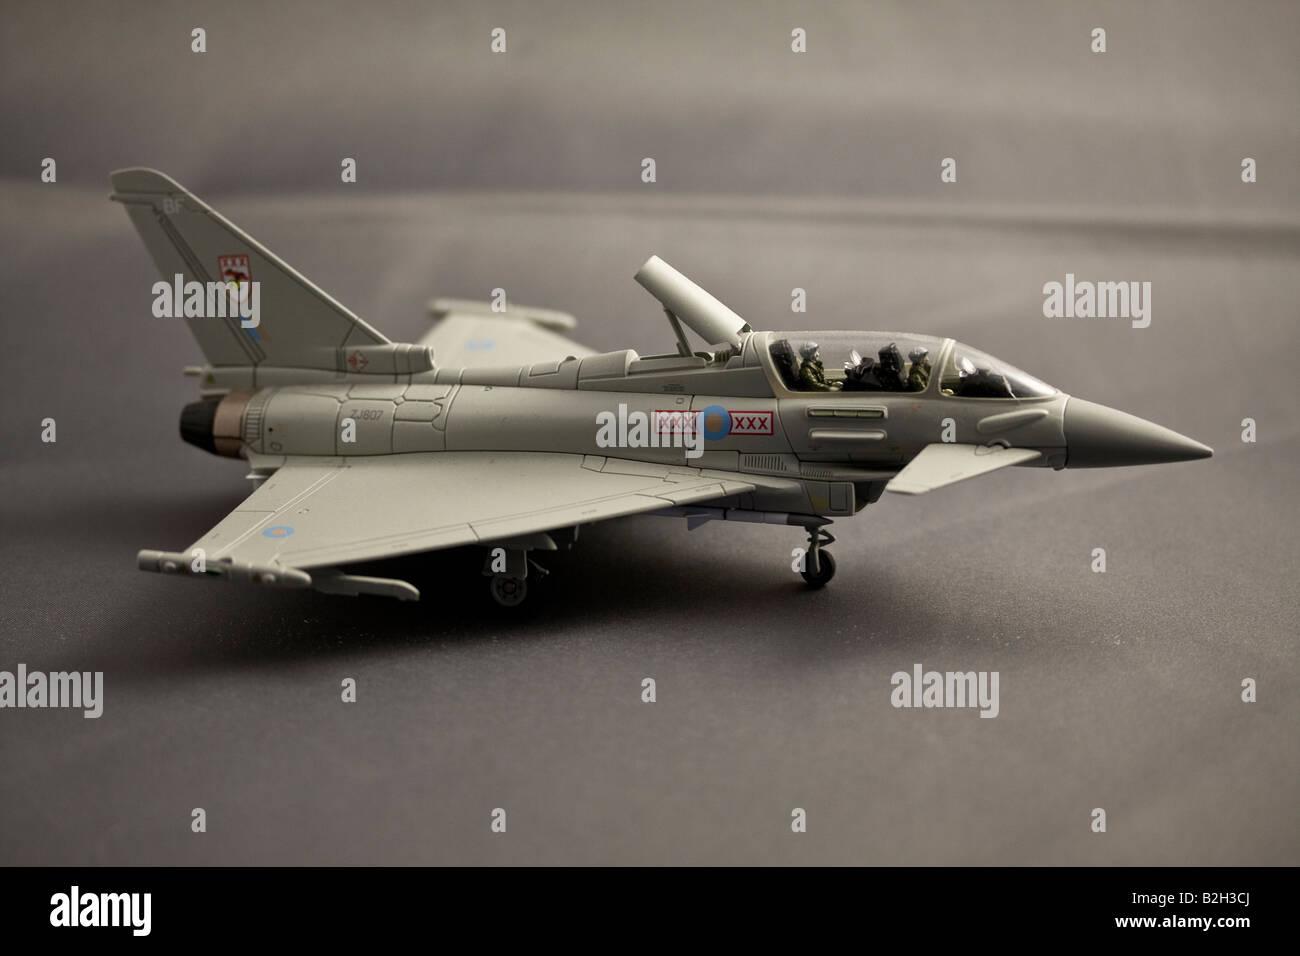 Model of Typhoon Eurofigher made by Corgi - Stock Image